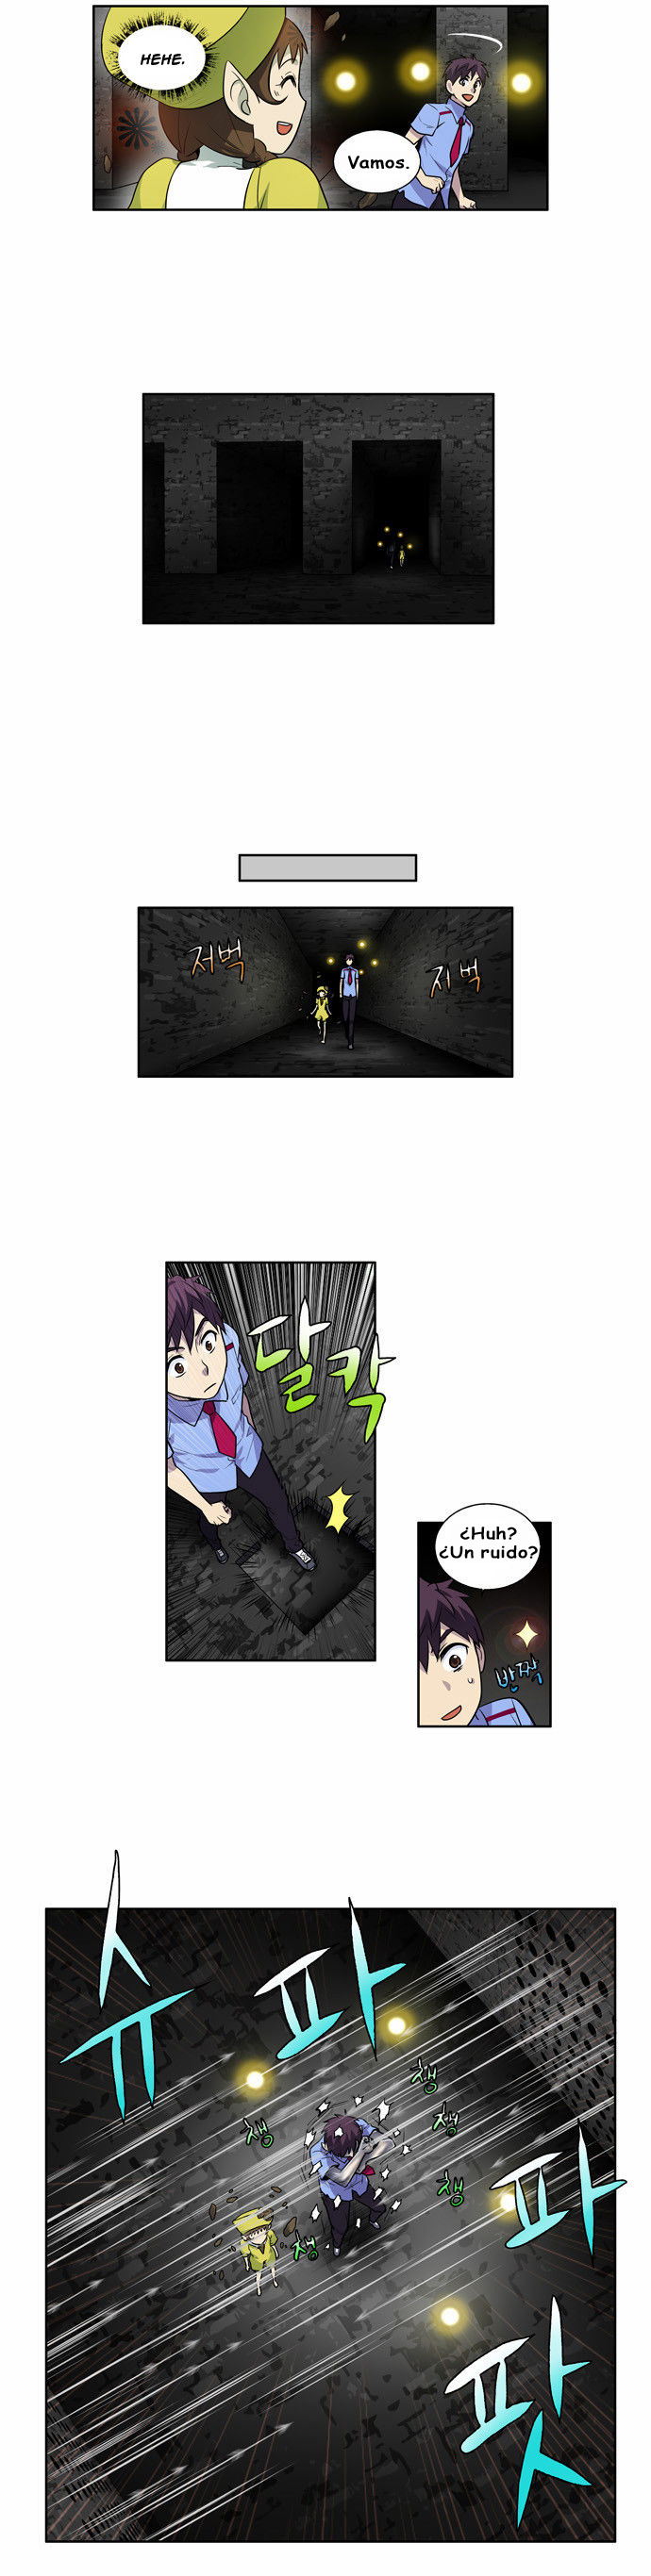 http://c5.ninemanga.com/es_manga/61/1725/396909/9744d4f003ffdce5eaa7fa9586087114.jpg Page 5